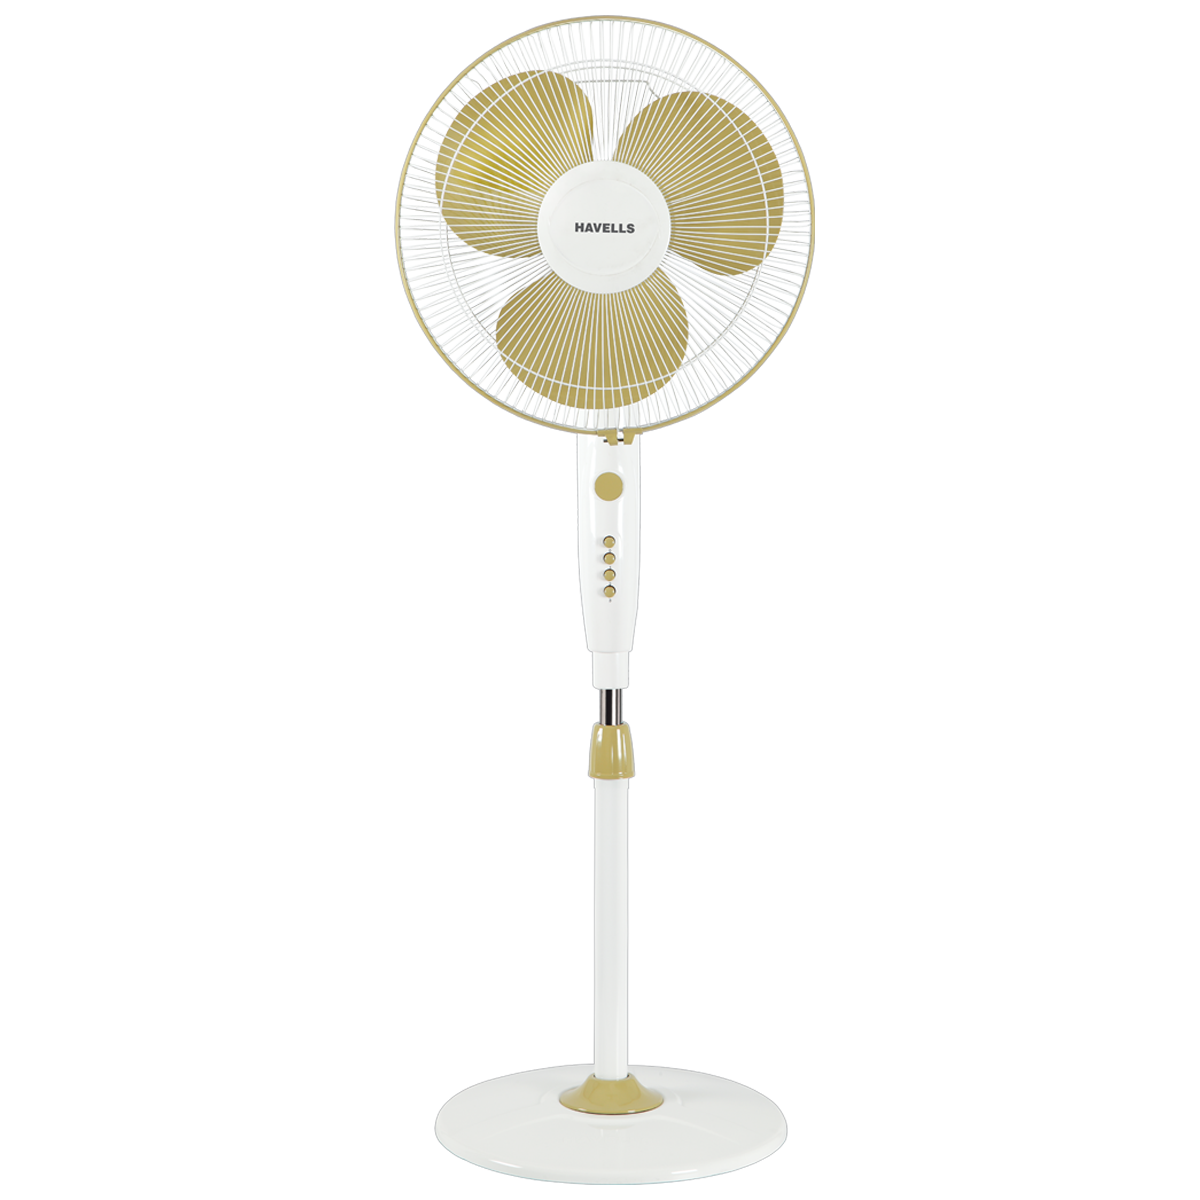 Havells Trendy 40cm Sweep 3 Blade Pedestal Fan (Double Ball Bearing, FHSTRNSGOW16, Golden White)_1